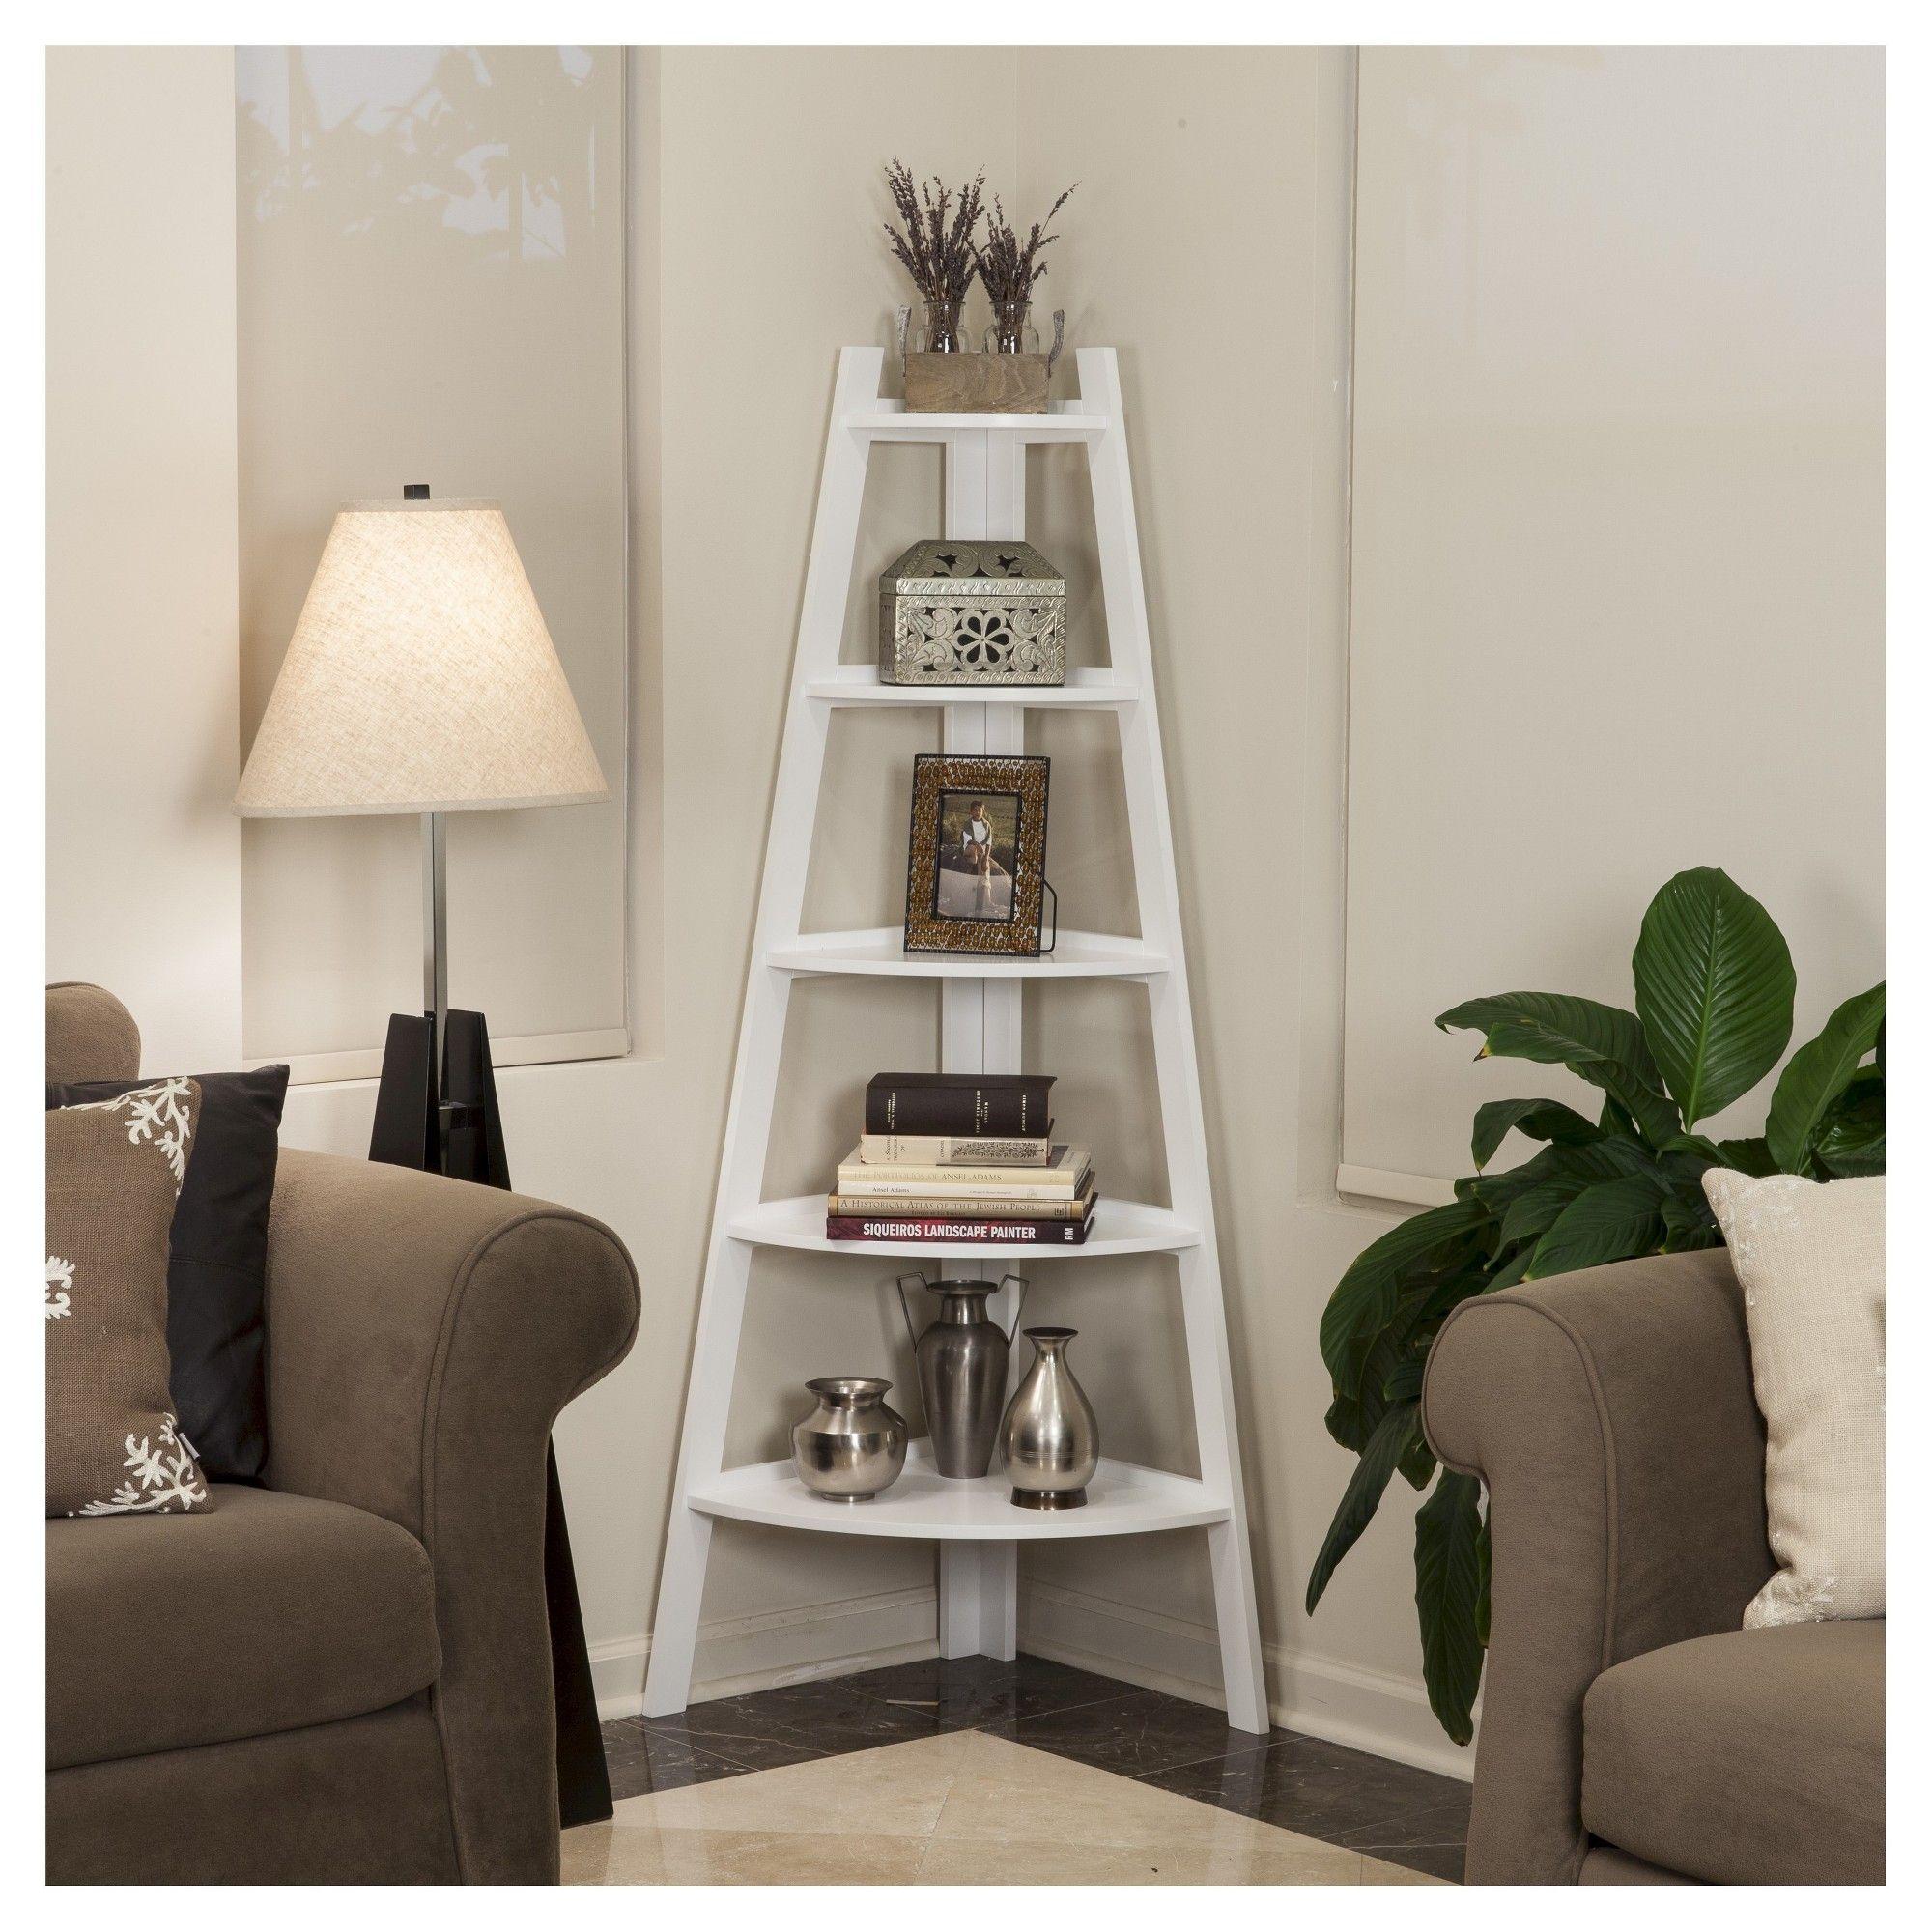 Shelving unit white decorative bookshelf